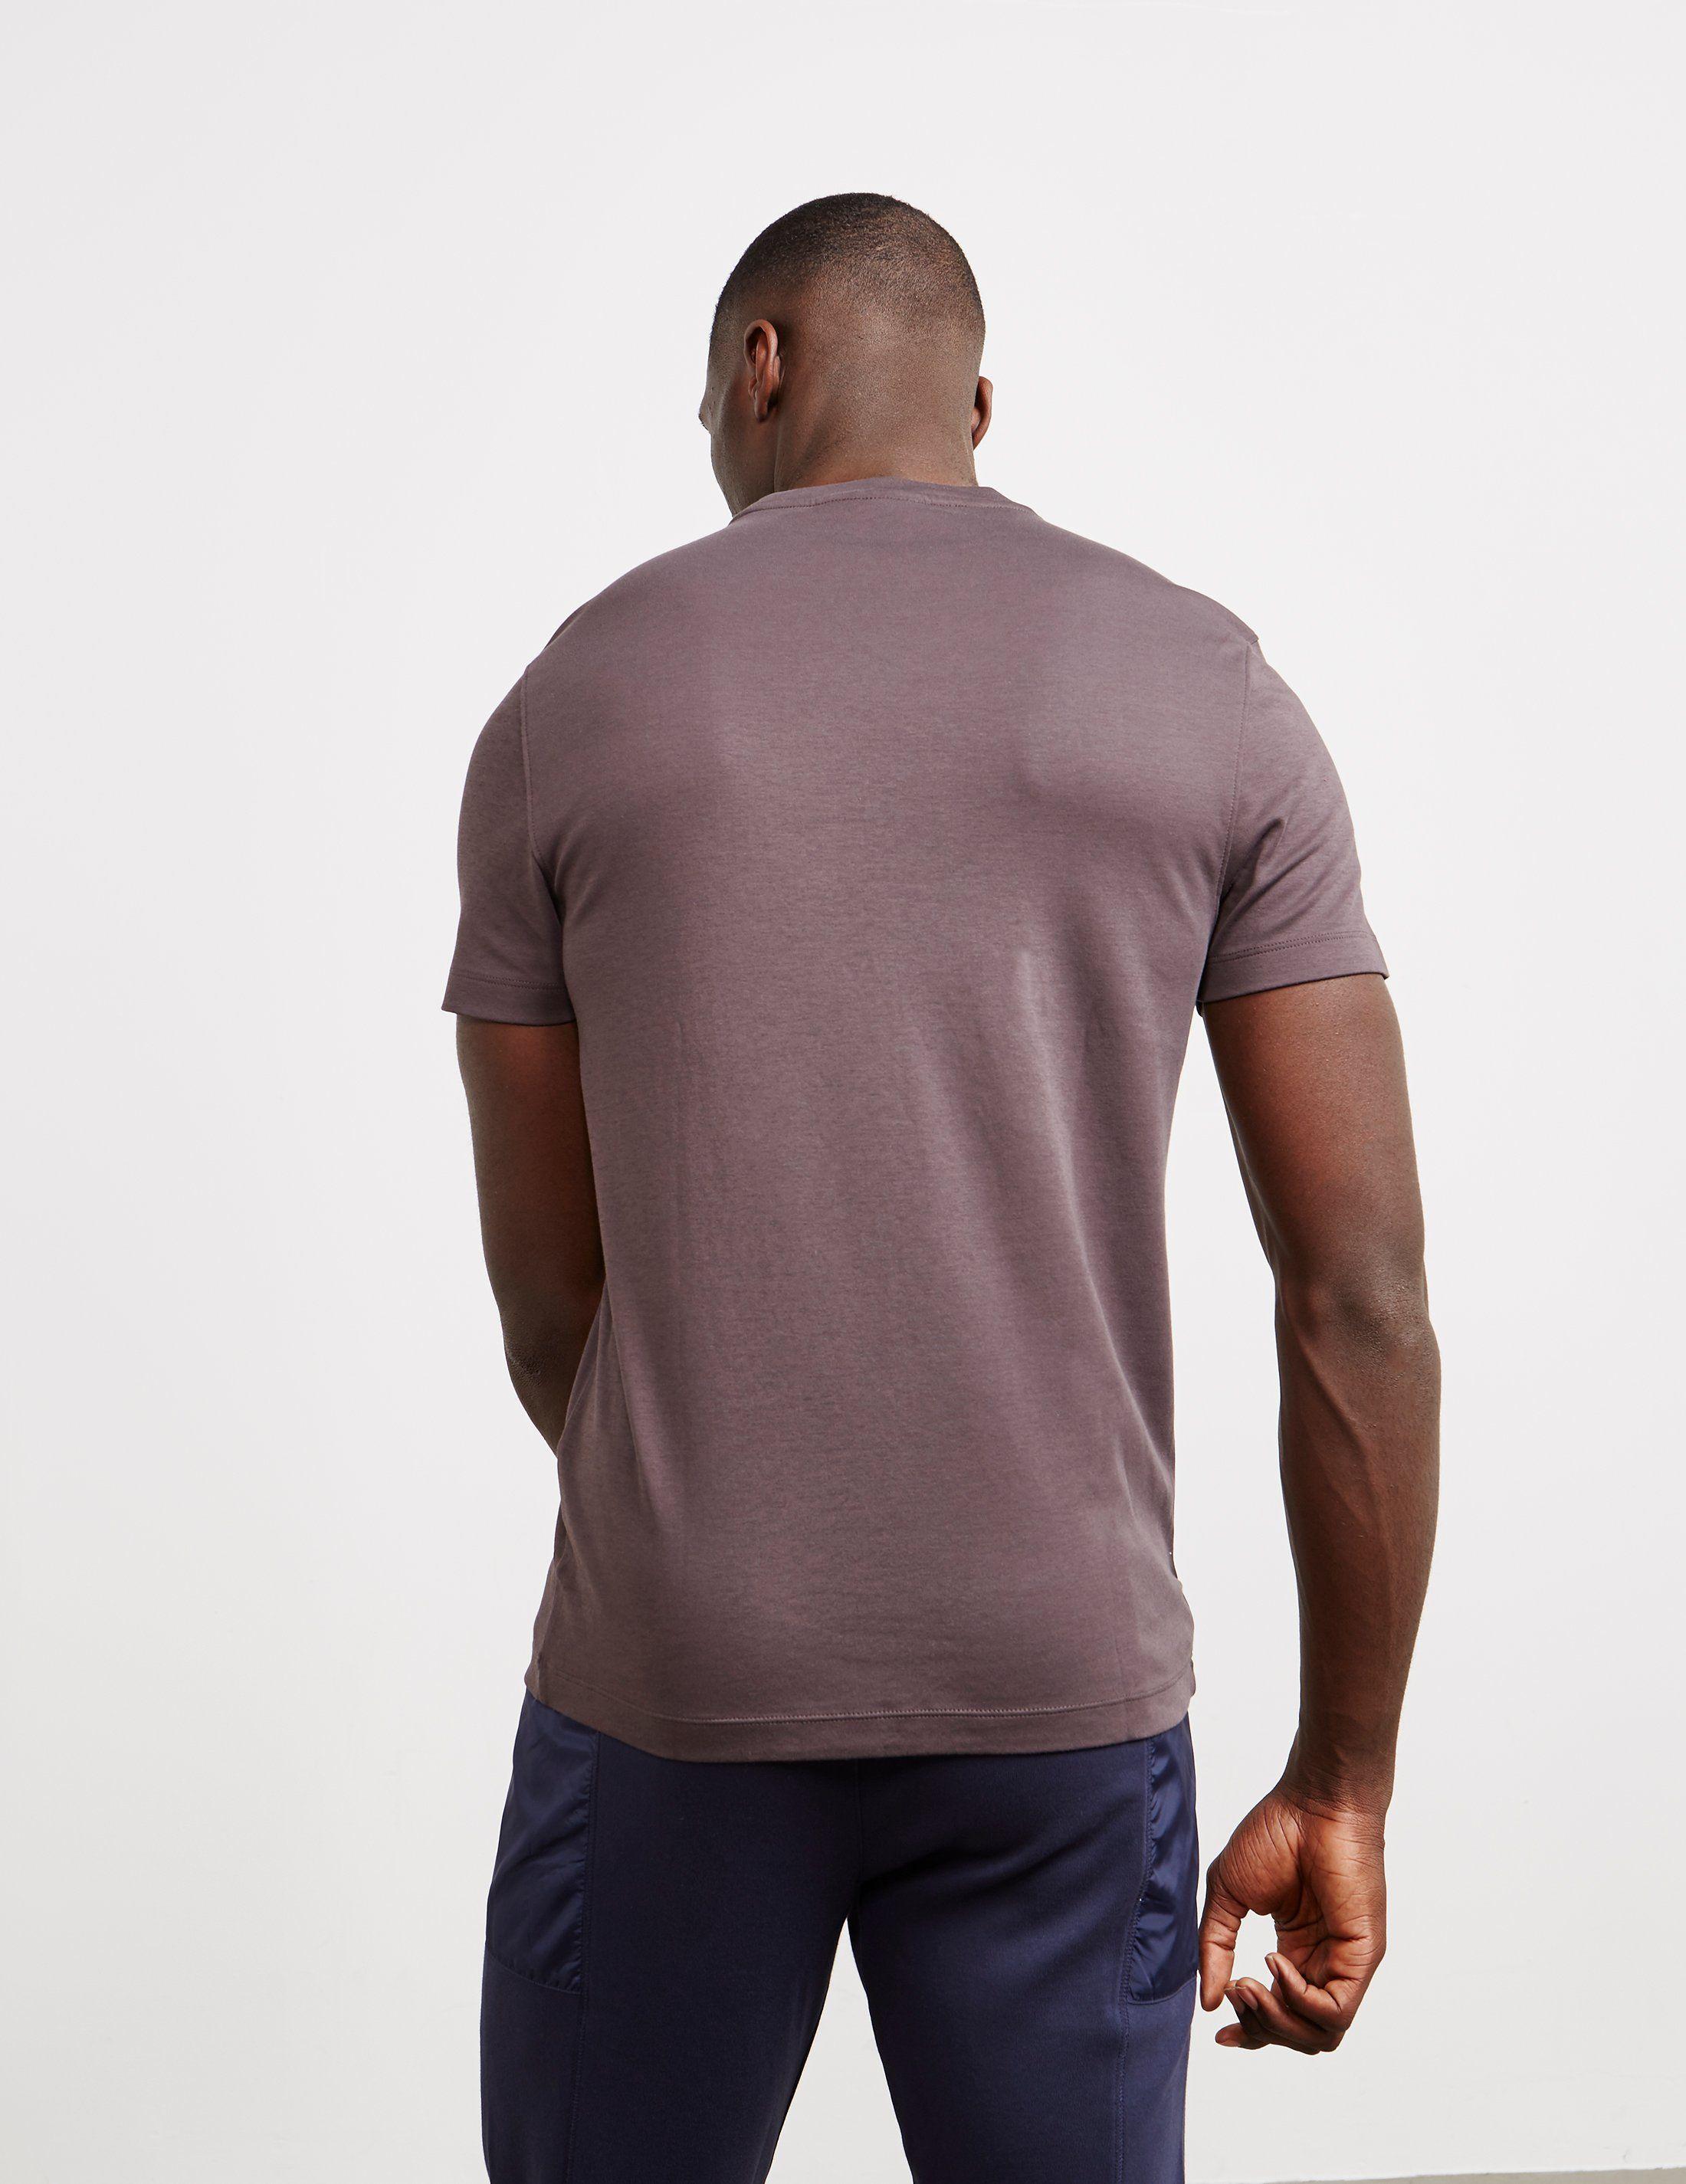 Michael Kors Sleek Short Sleeve T-Shirt